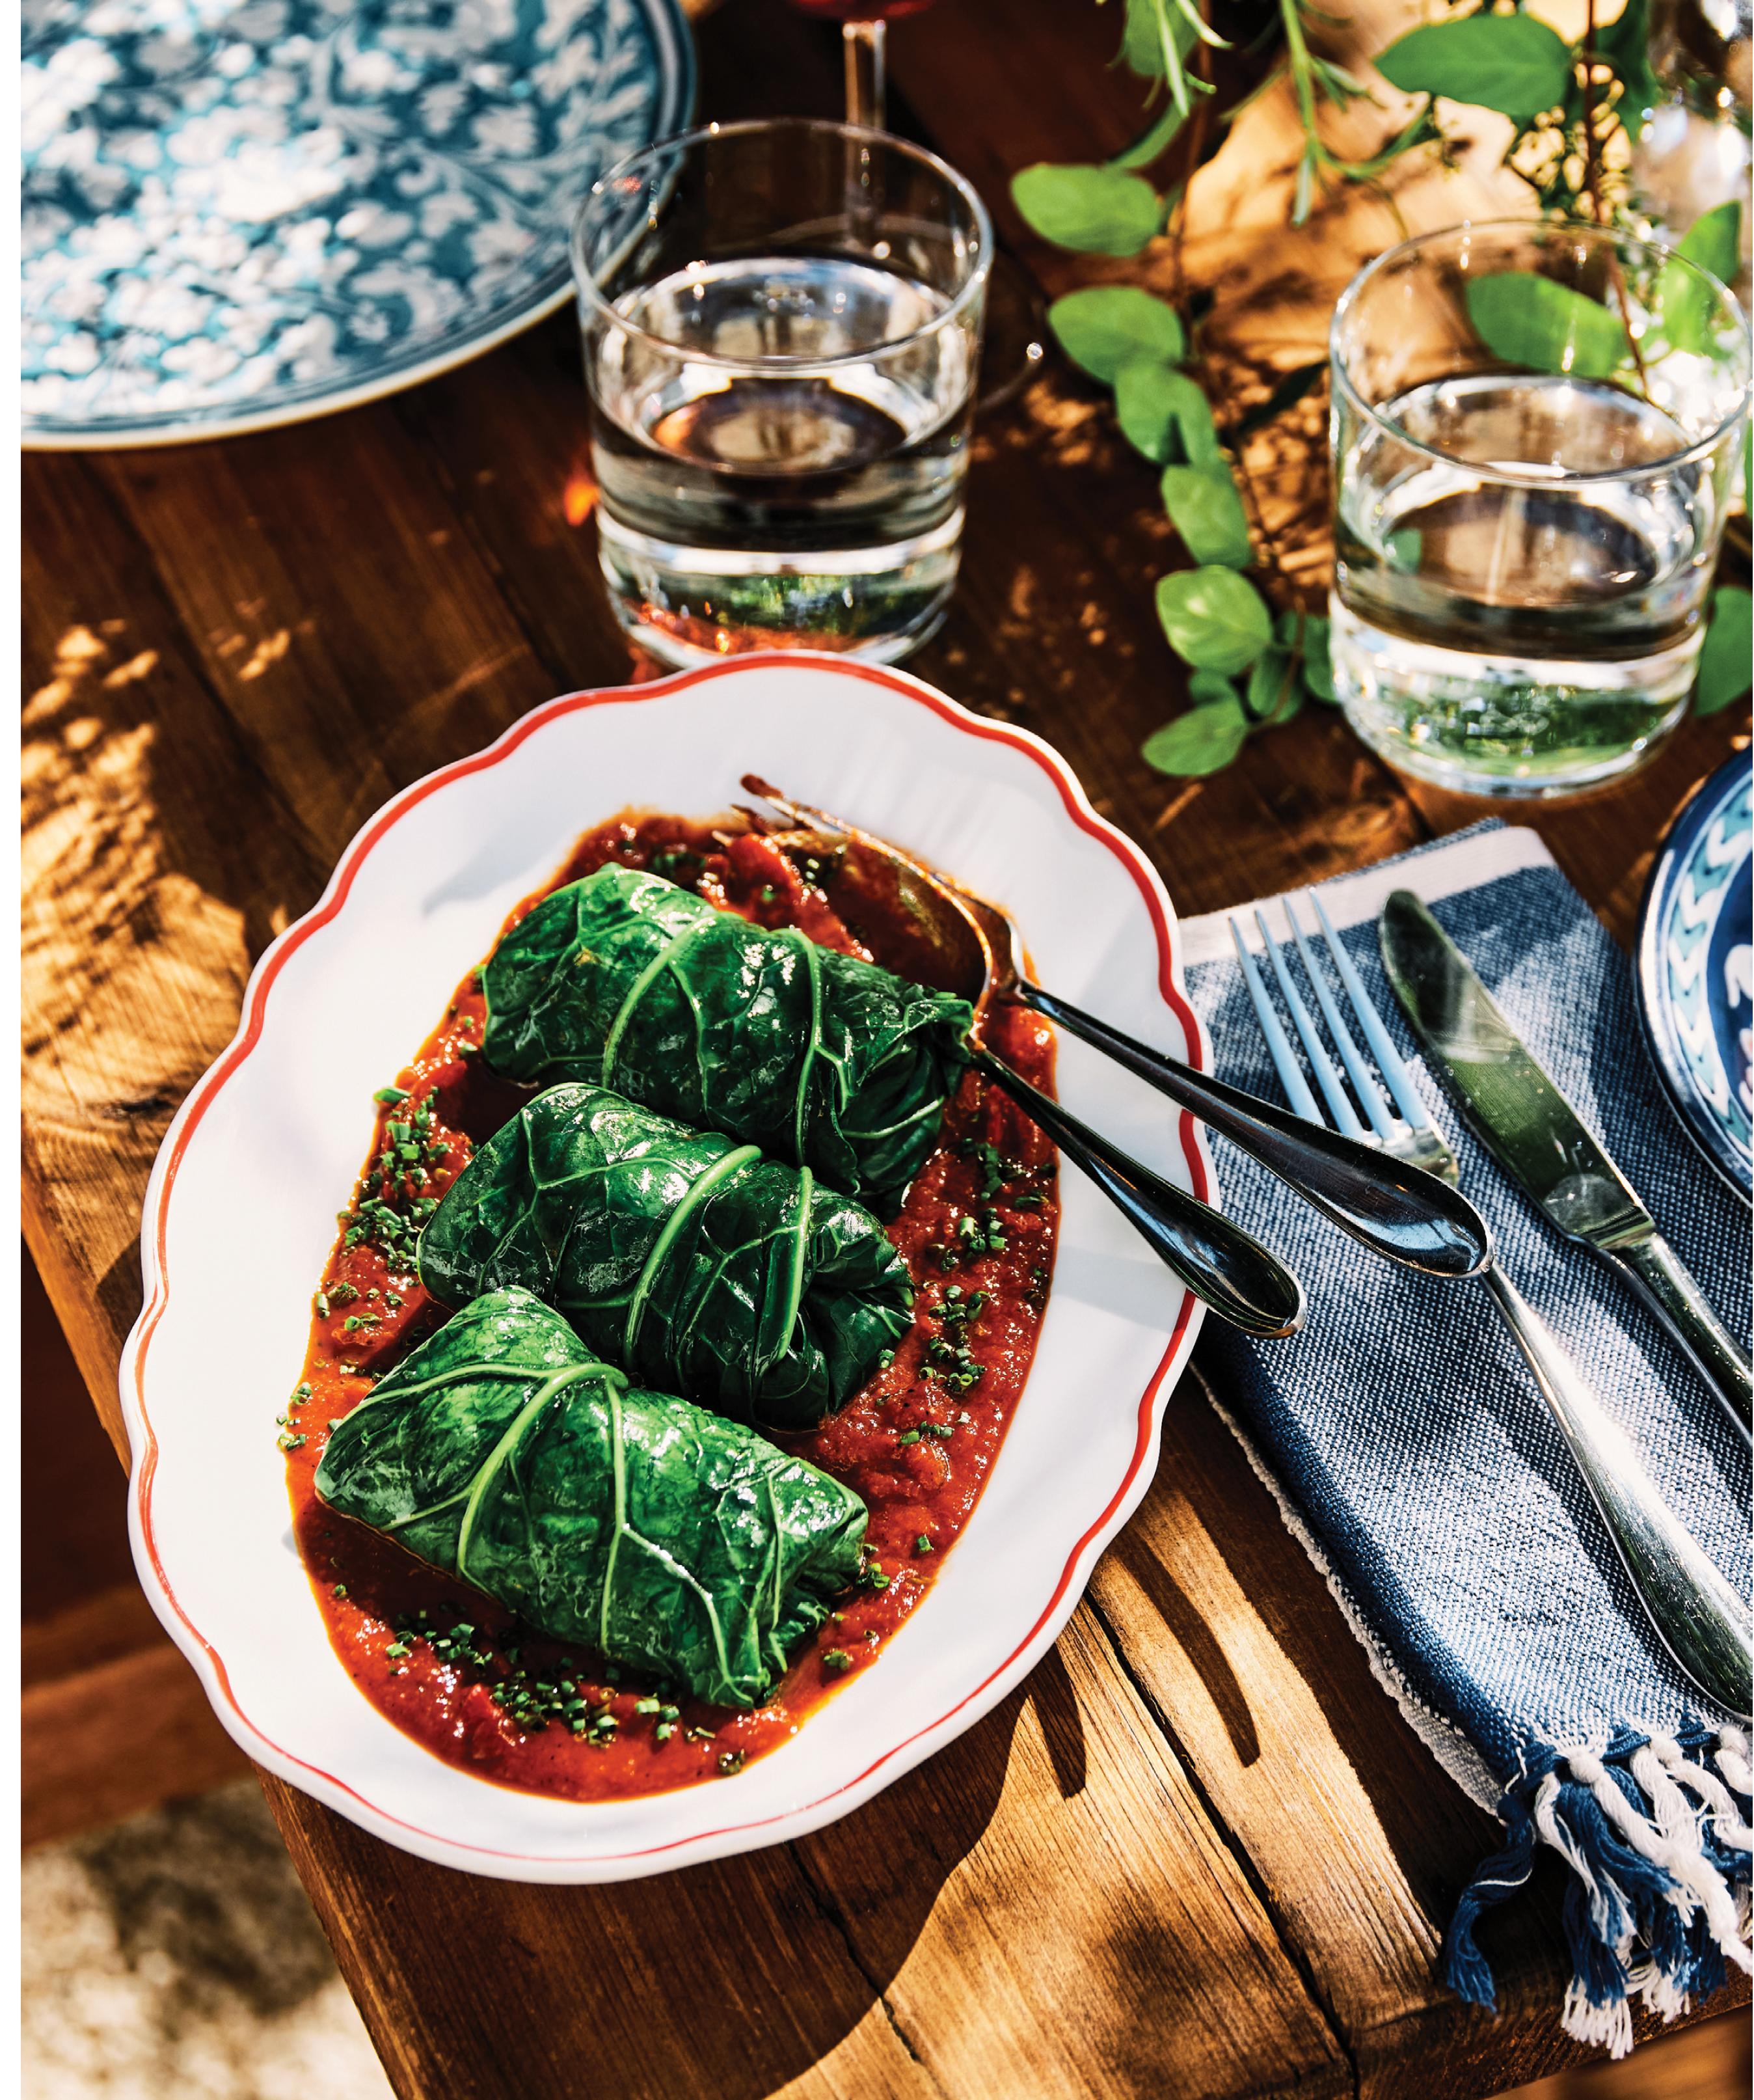 Basic Kitchen's Sea Island Red Pea-Stuffed Bradford Collards